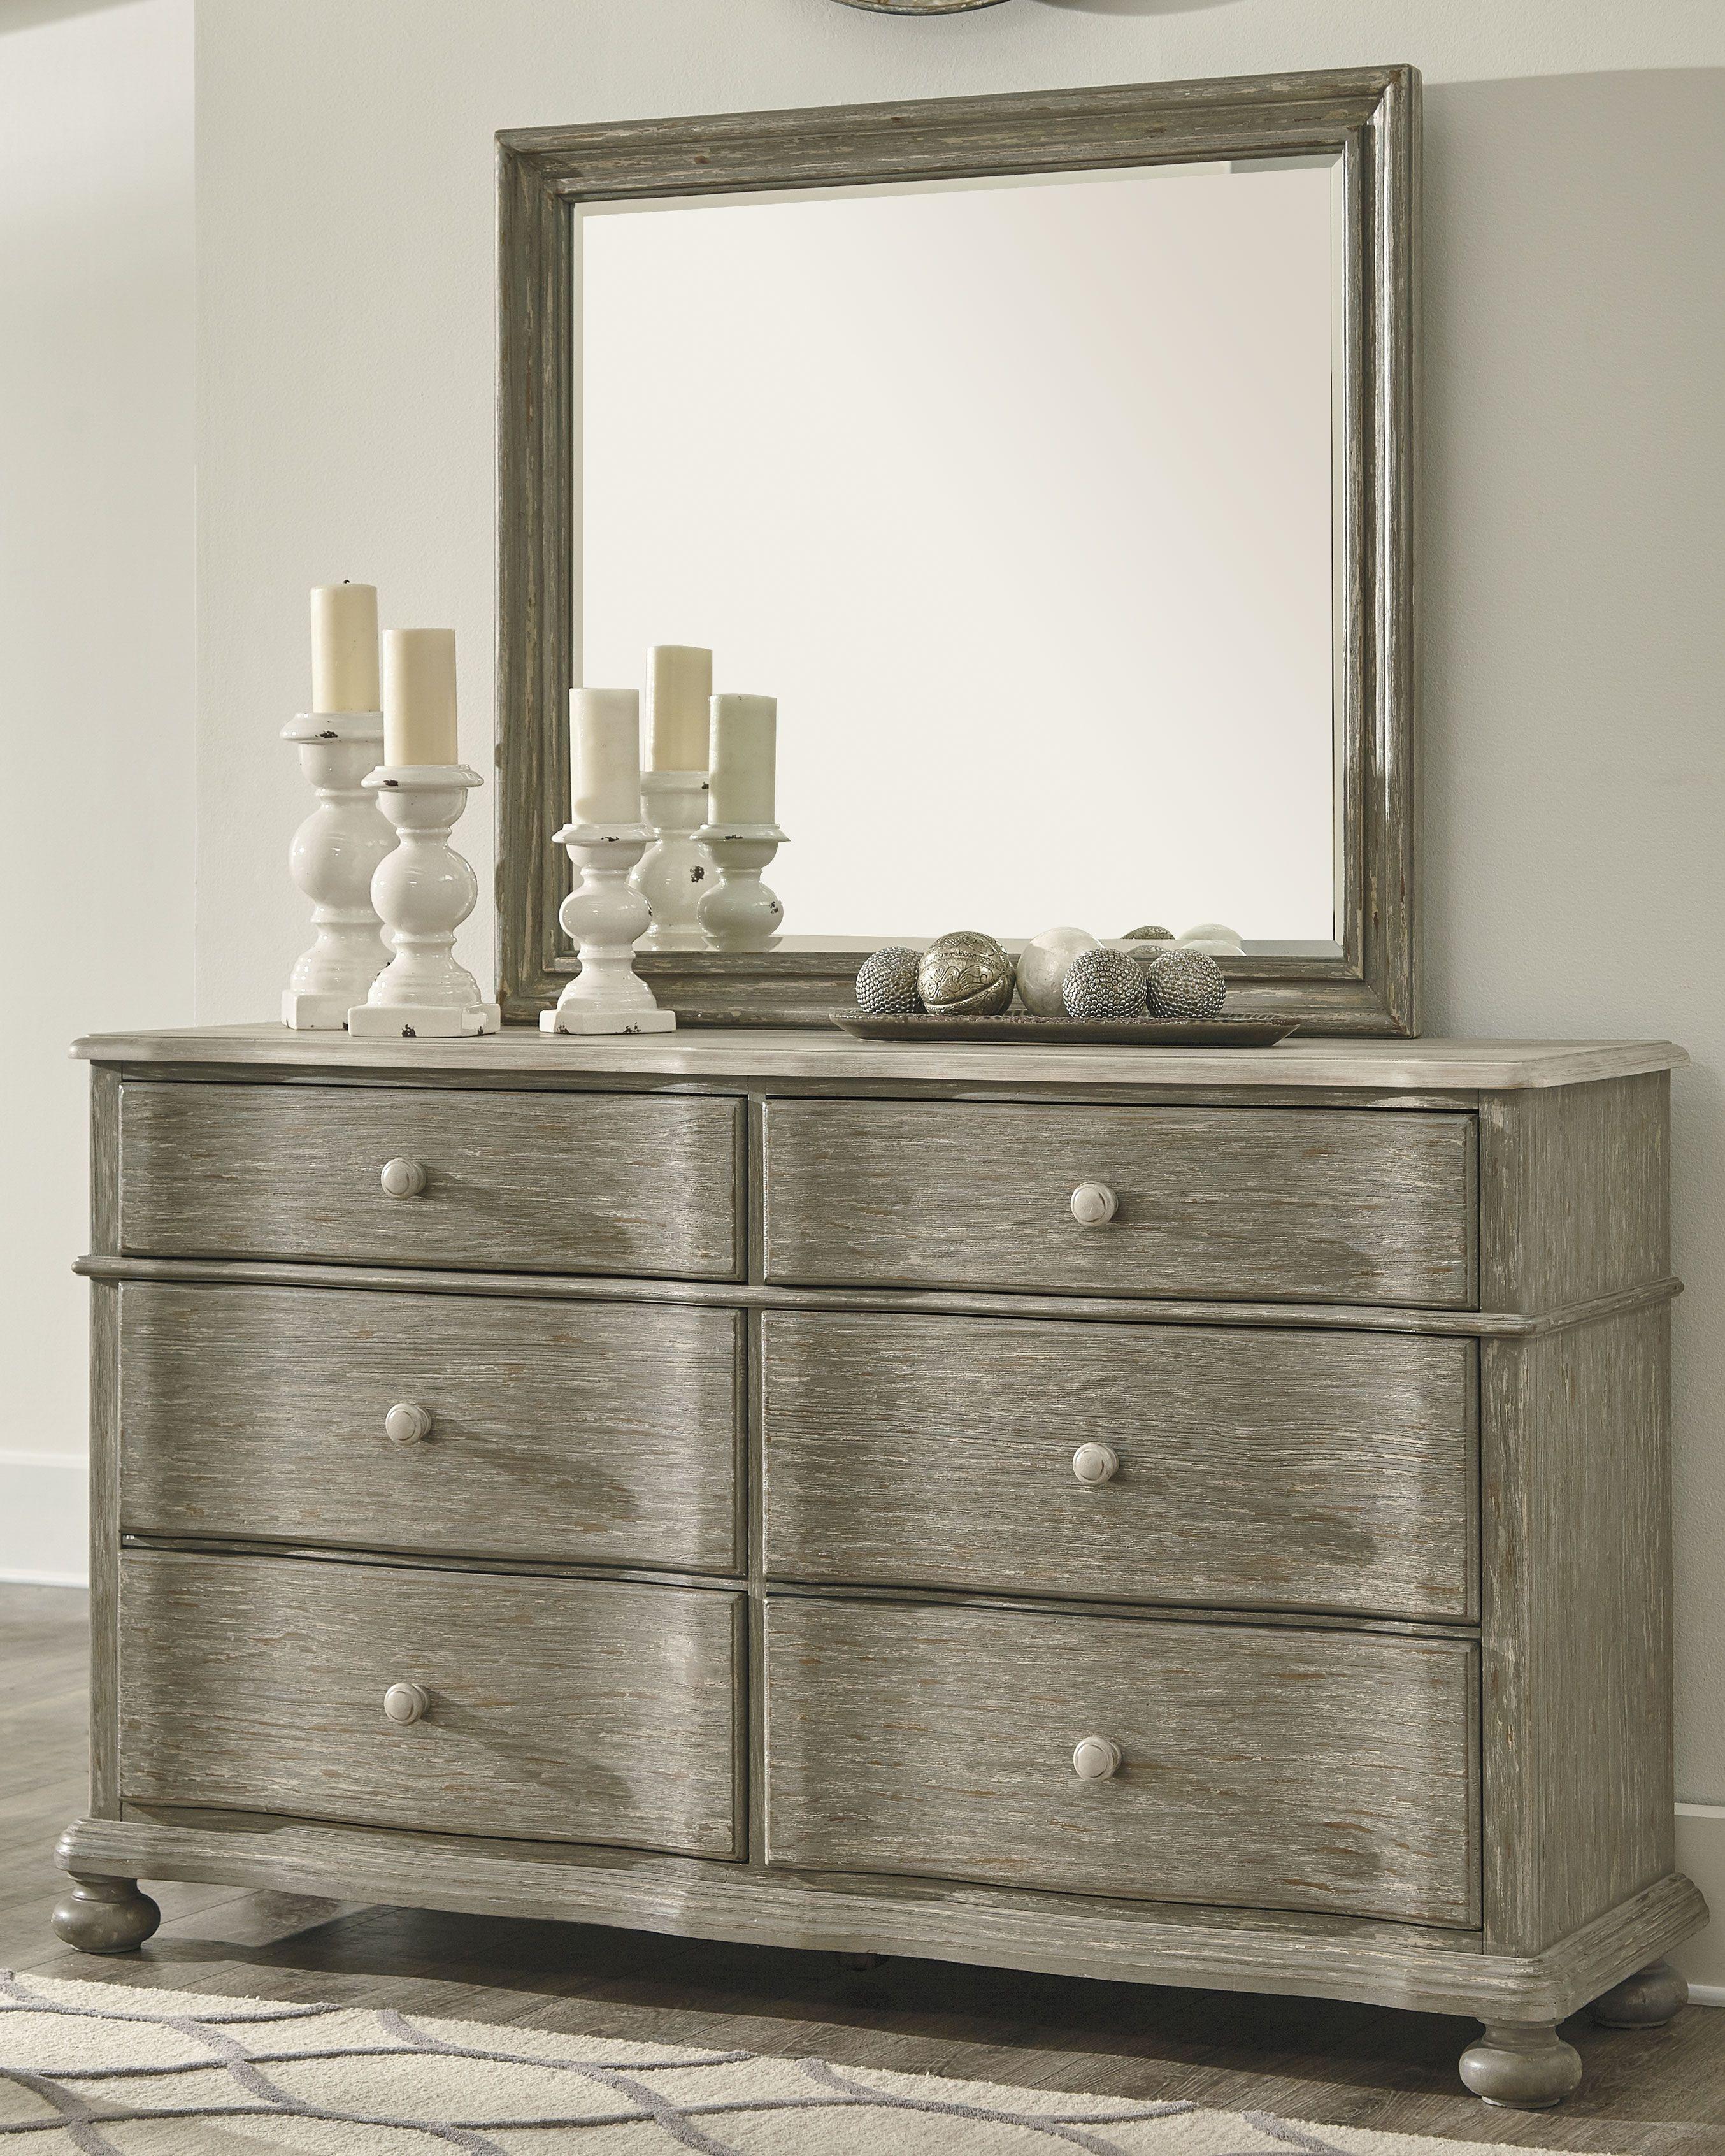 Marleny Dresser Gray Whitewash Grey Bedroom Furniture Small Kitchen Furniture Furniture